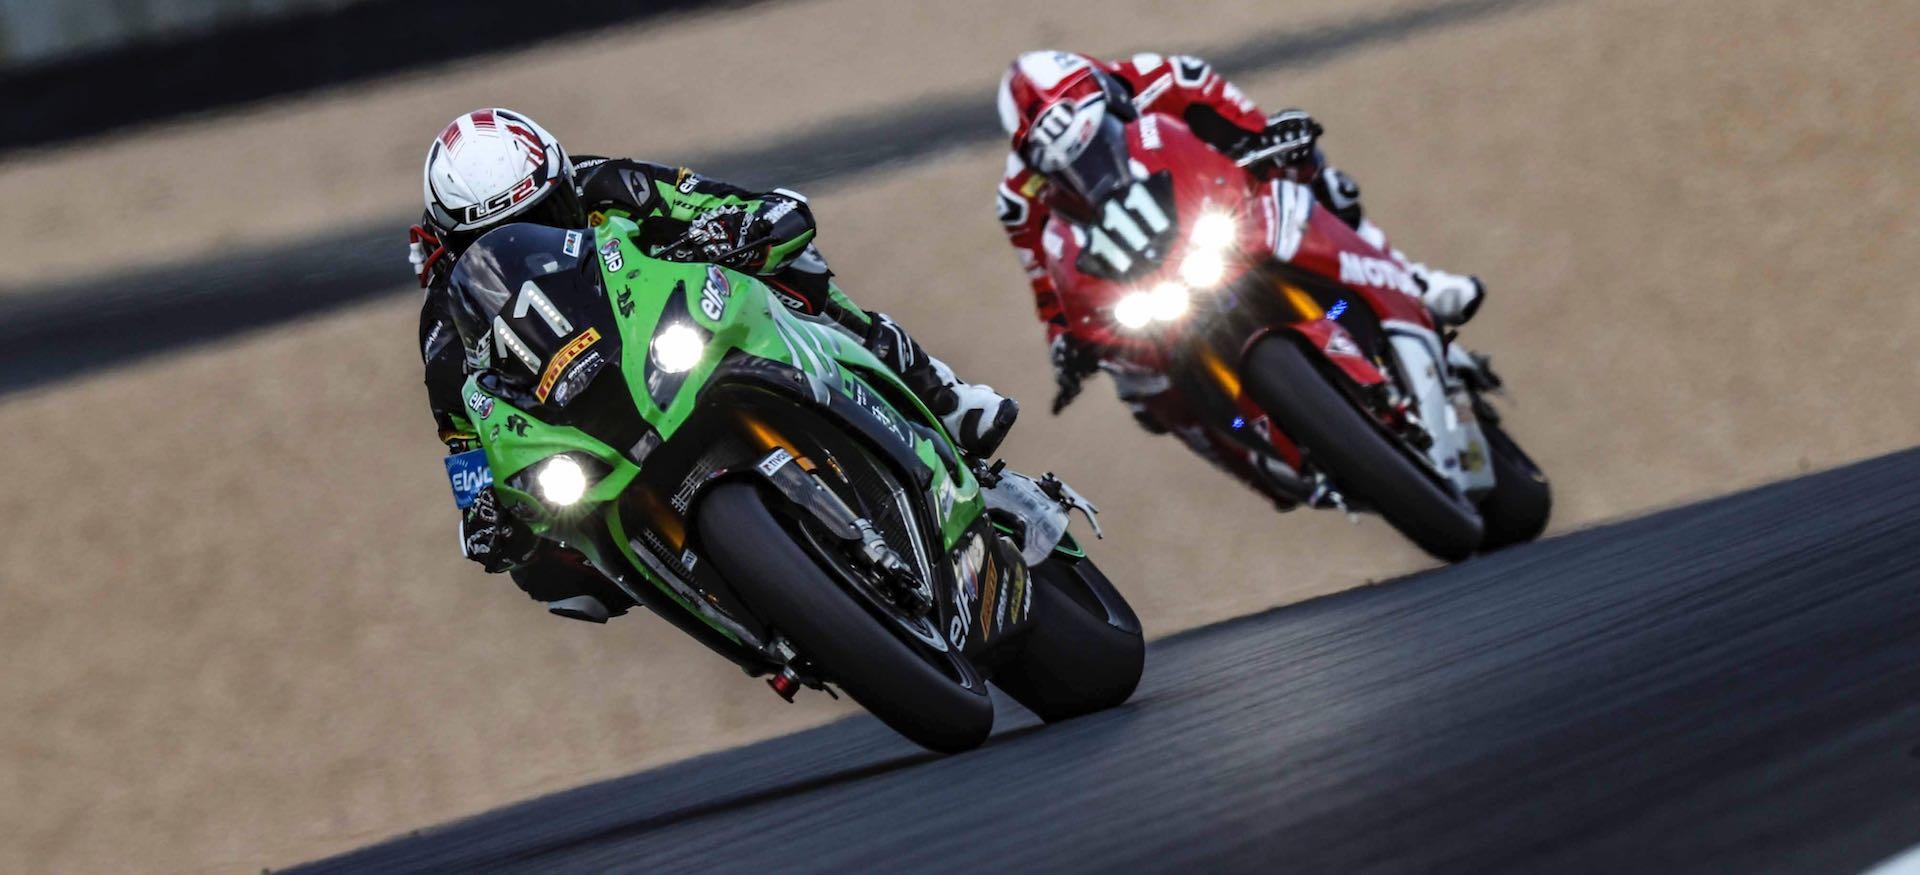 RK Chain en Le Mans Francia